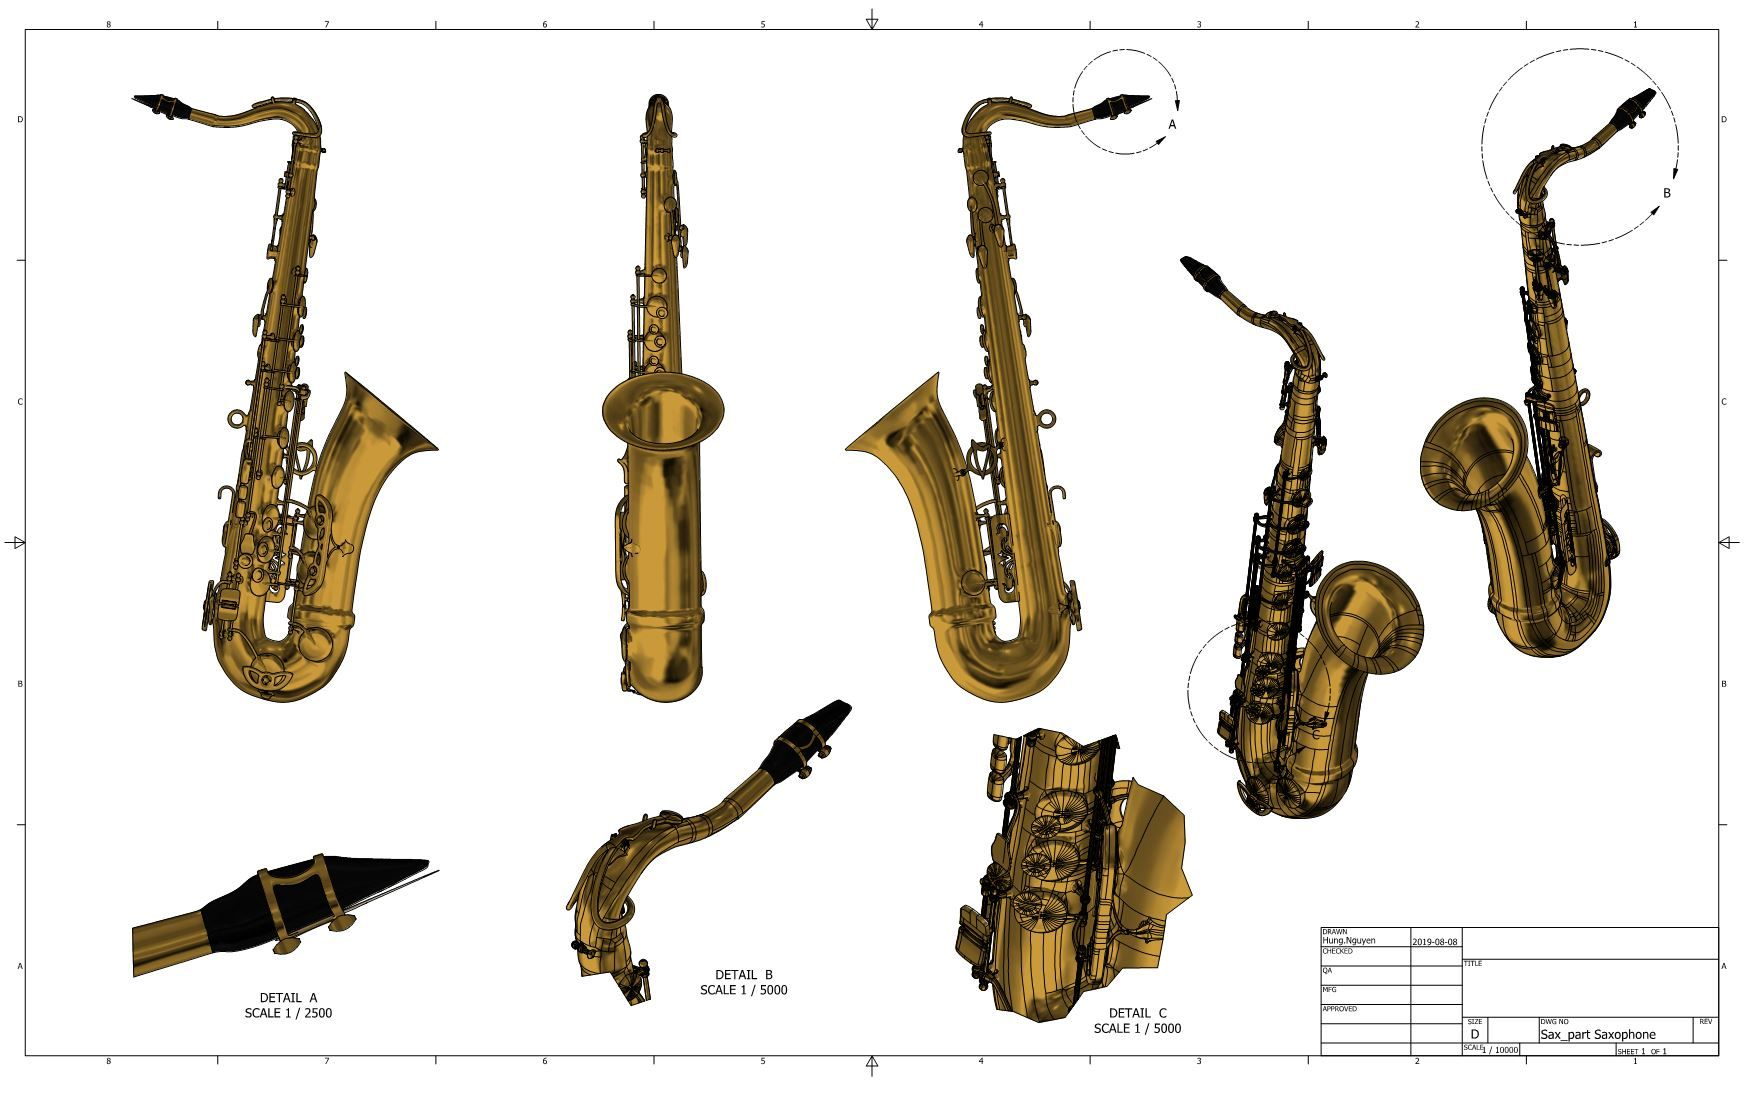 Sax-3-3500-3500